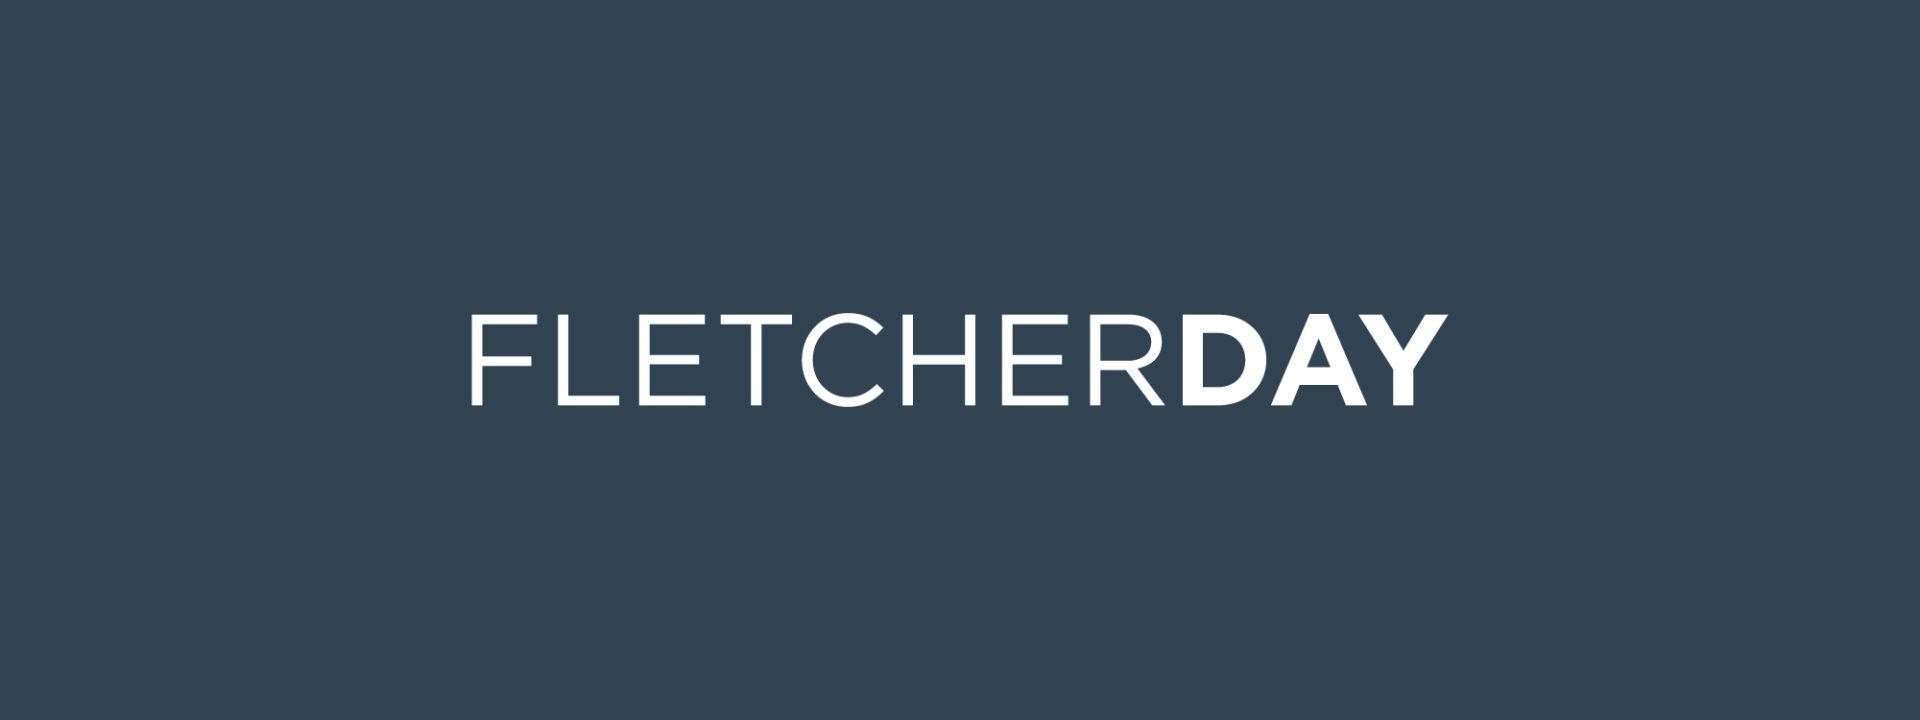 Fletcher Day Design Web Film